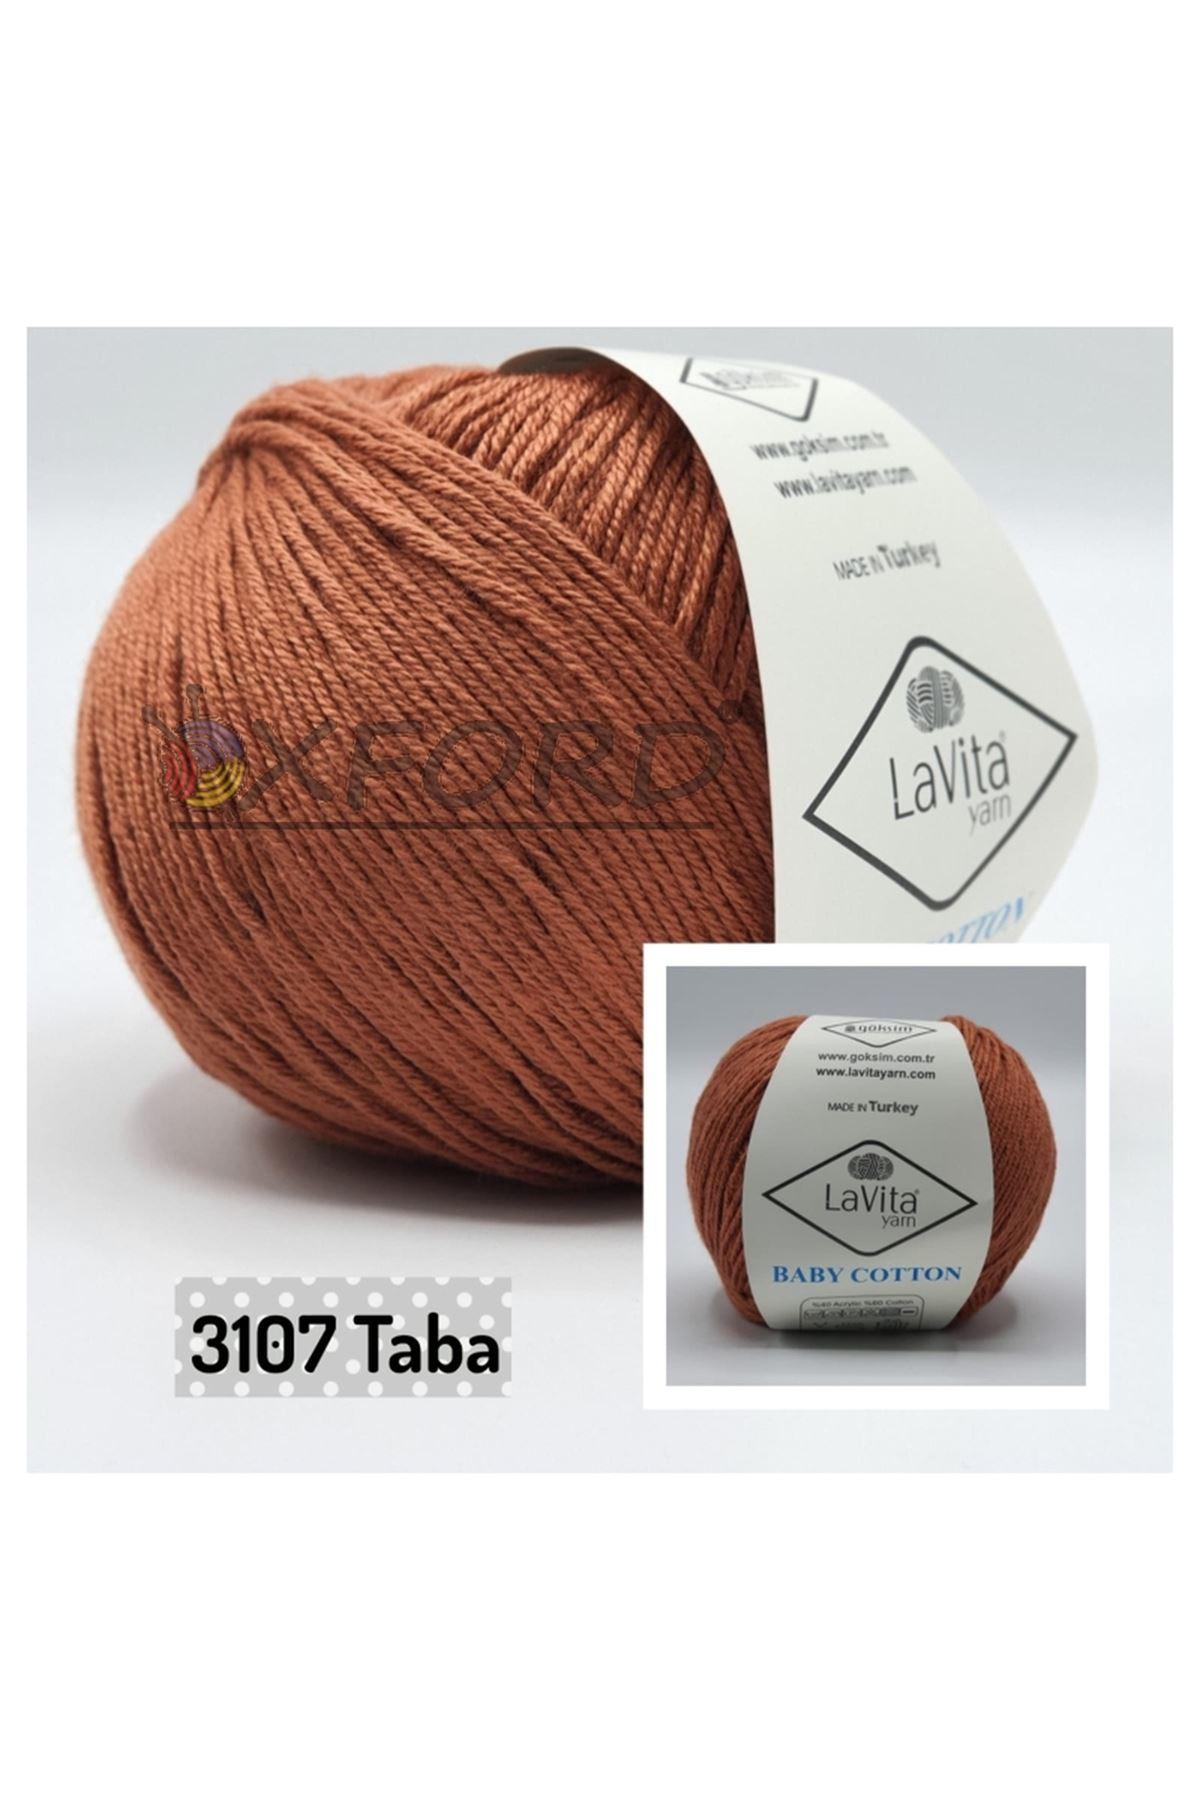 Lavita Baby Cotton 3107 Taba